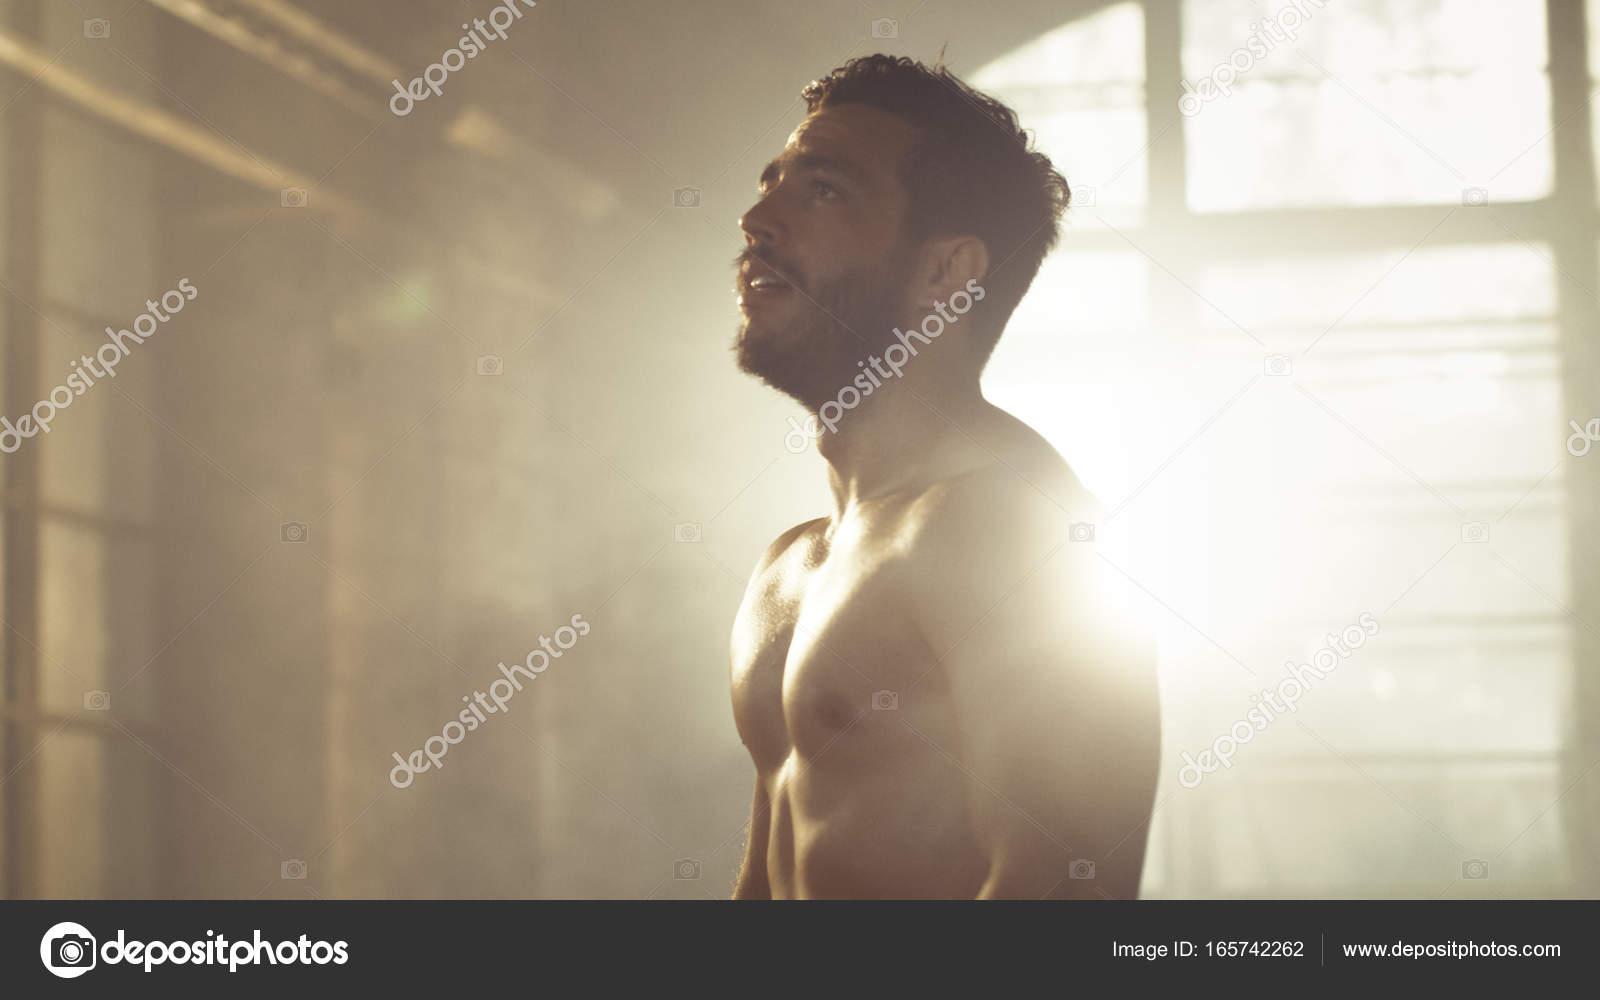 Schöner nackter Oberkörper Mann mit nackten muskulösen Oberkörper ...